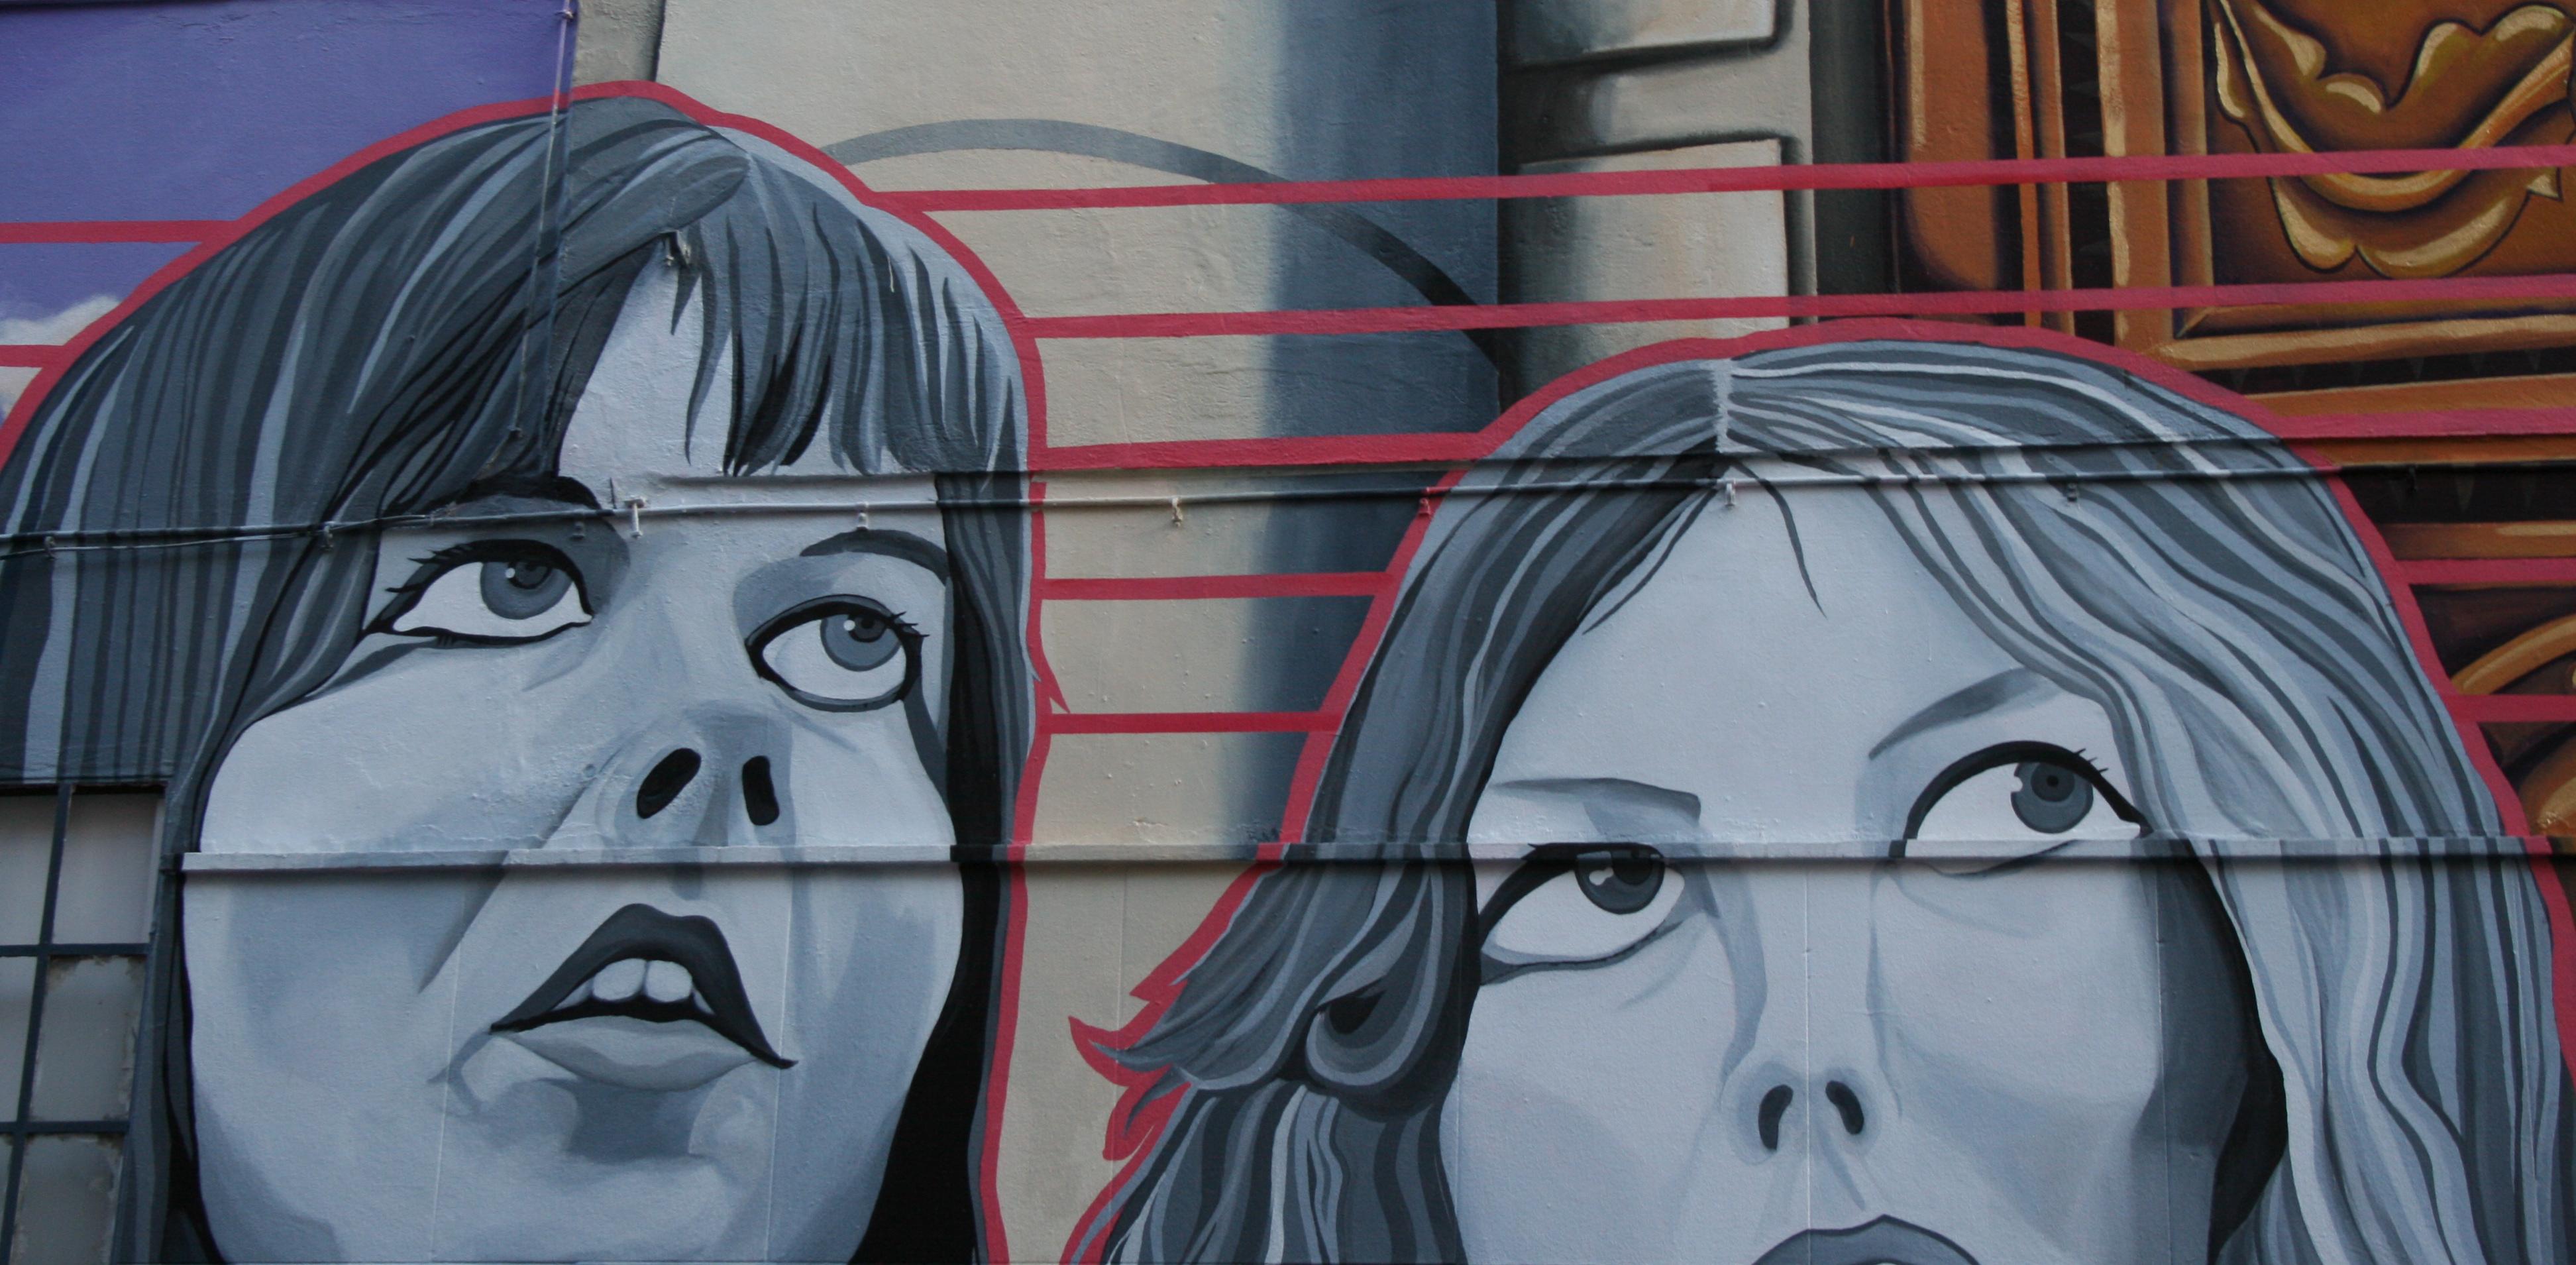 mural en el casco historico/medieval de Vitoria Gasteiz Street Art